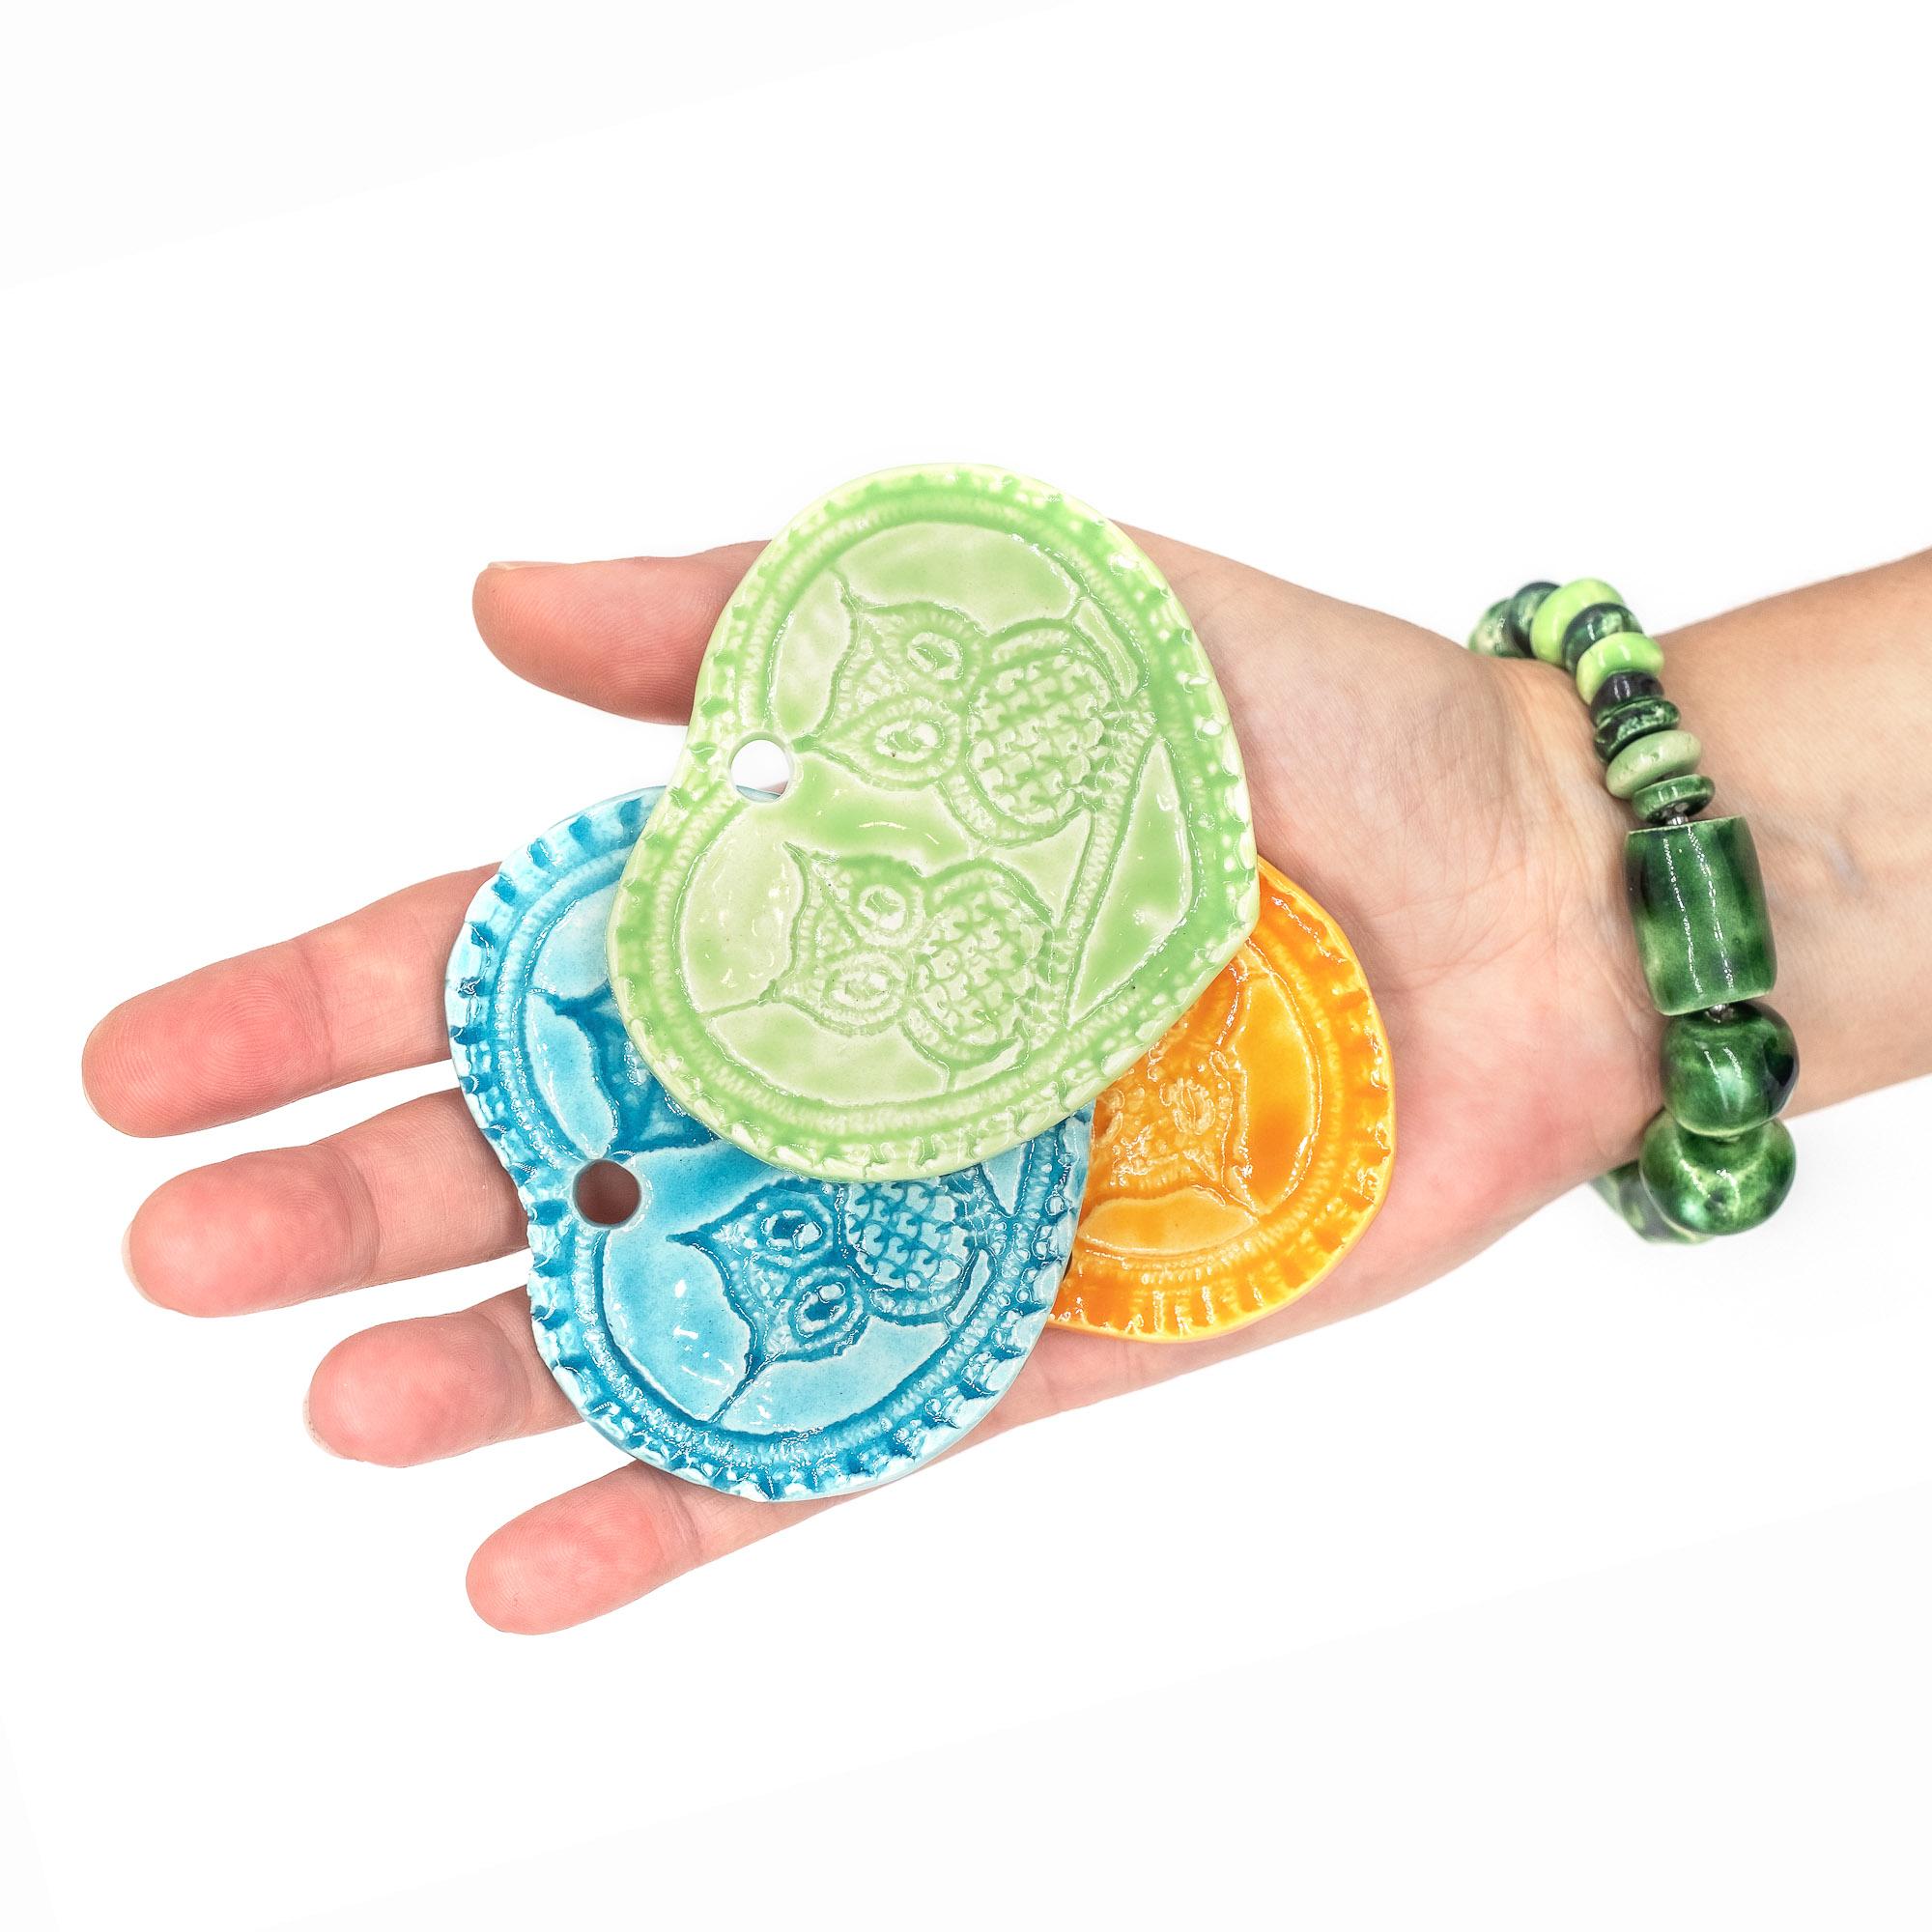 Oggettistica in ceramica - Stefania Mairano Creazioni in Ceramica